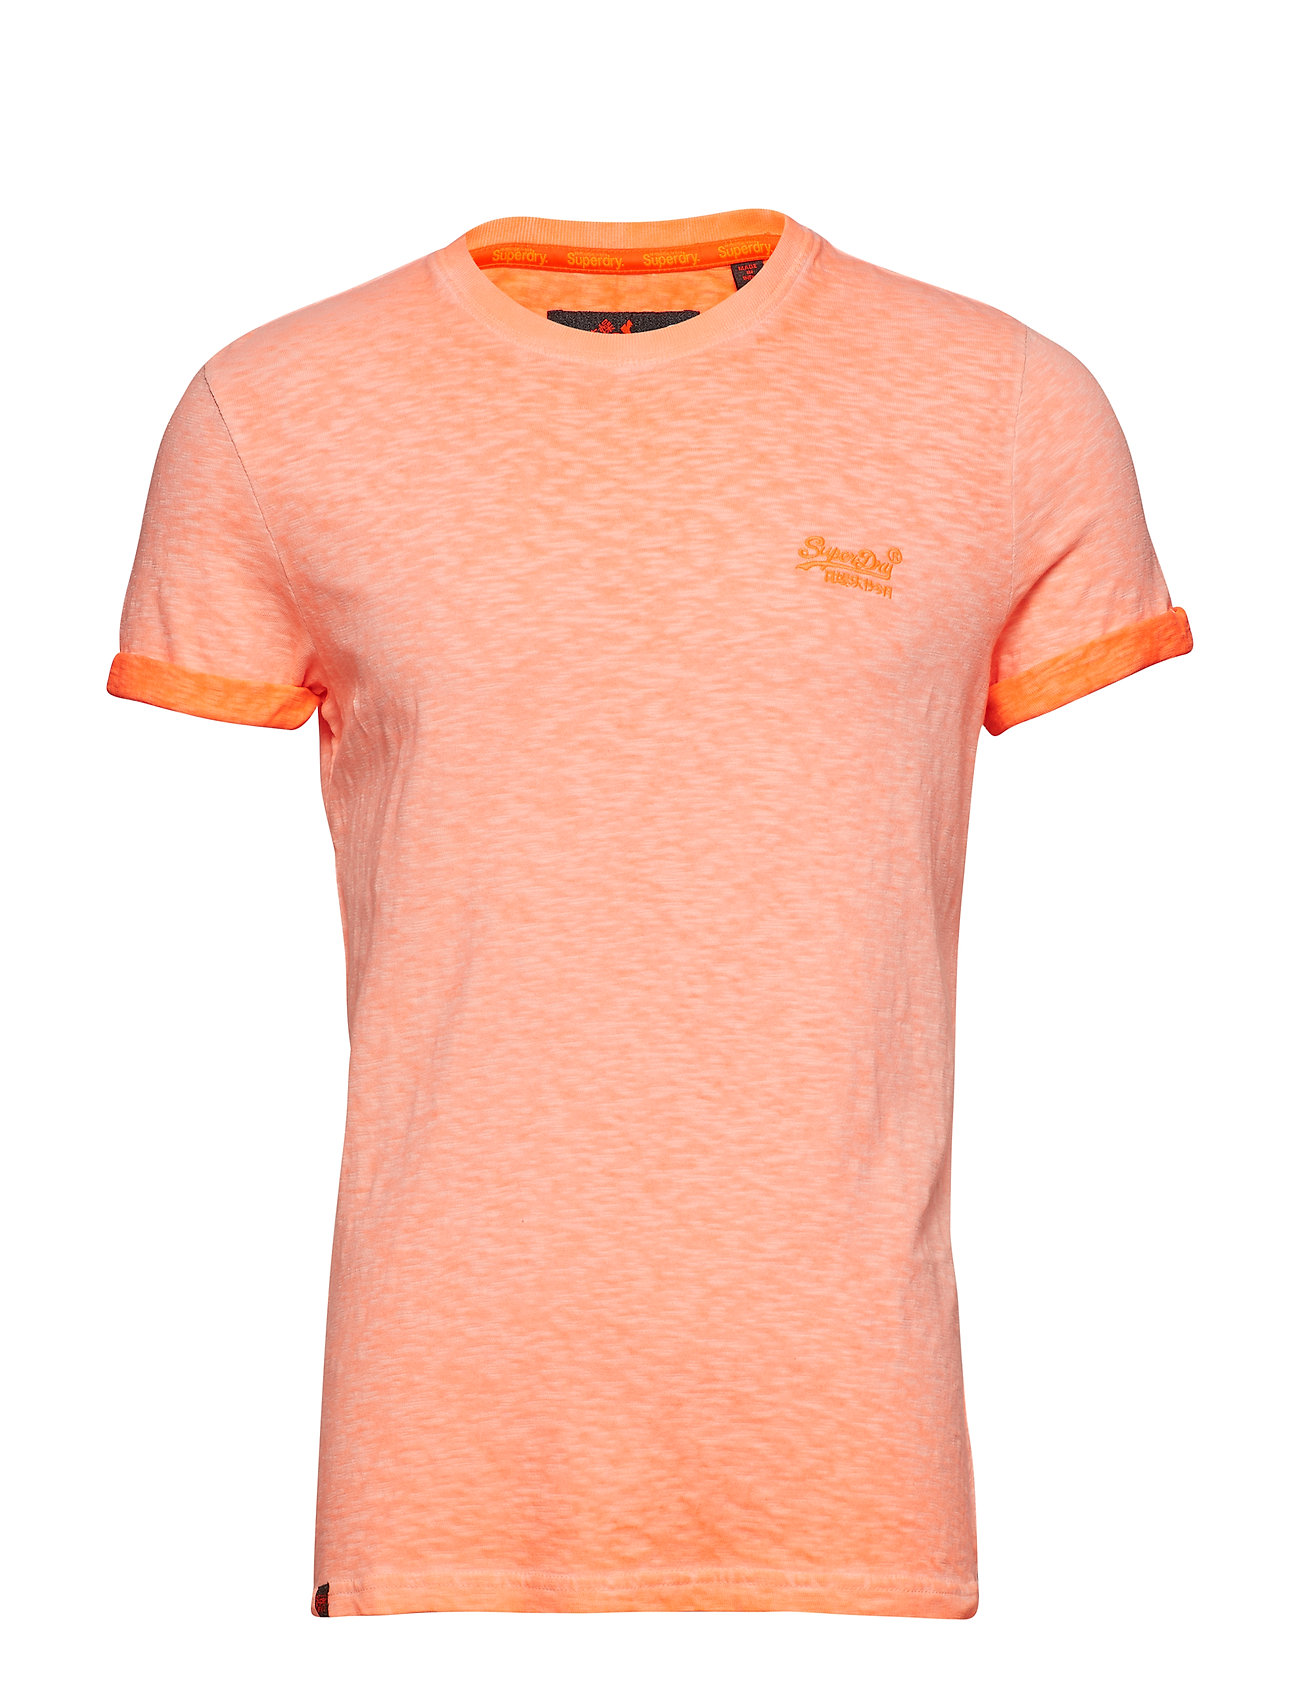 Low Roller Tee T shirt Orange SUPERDRY